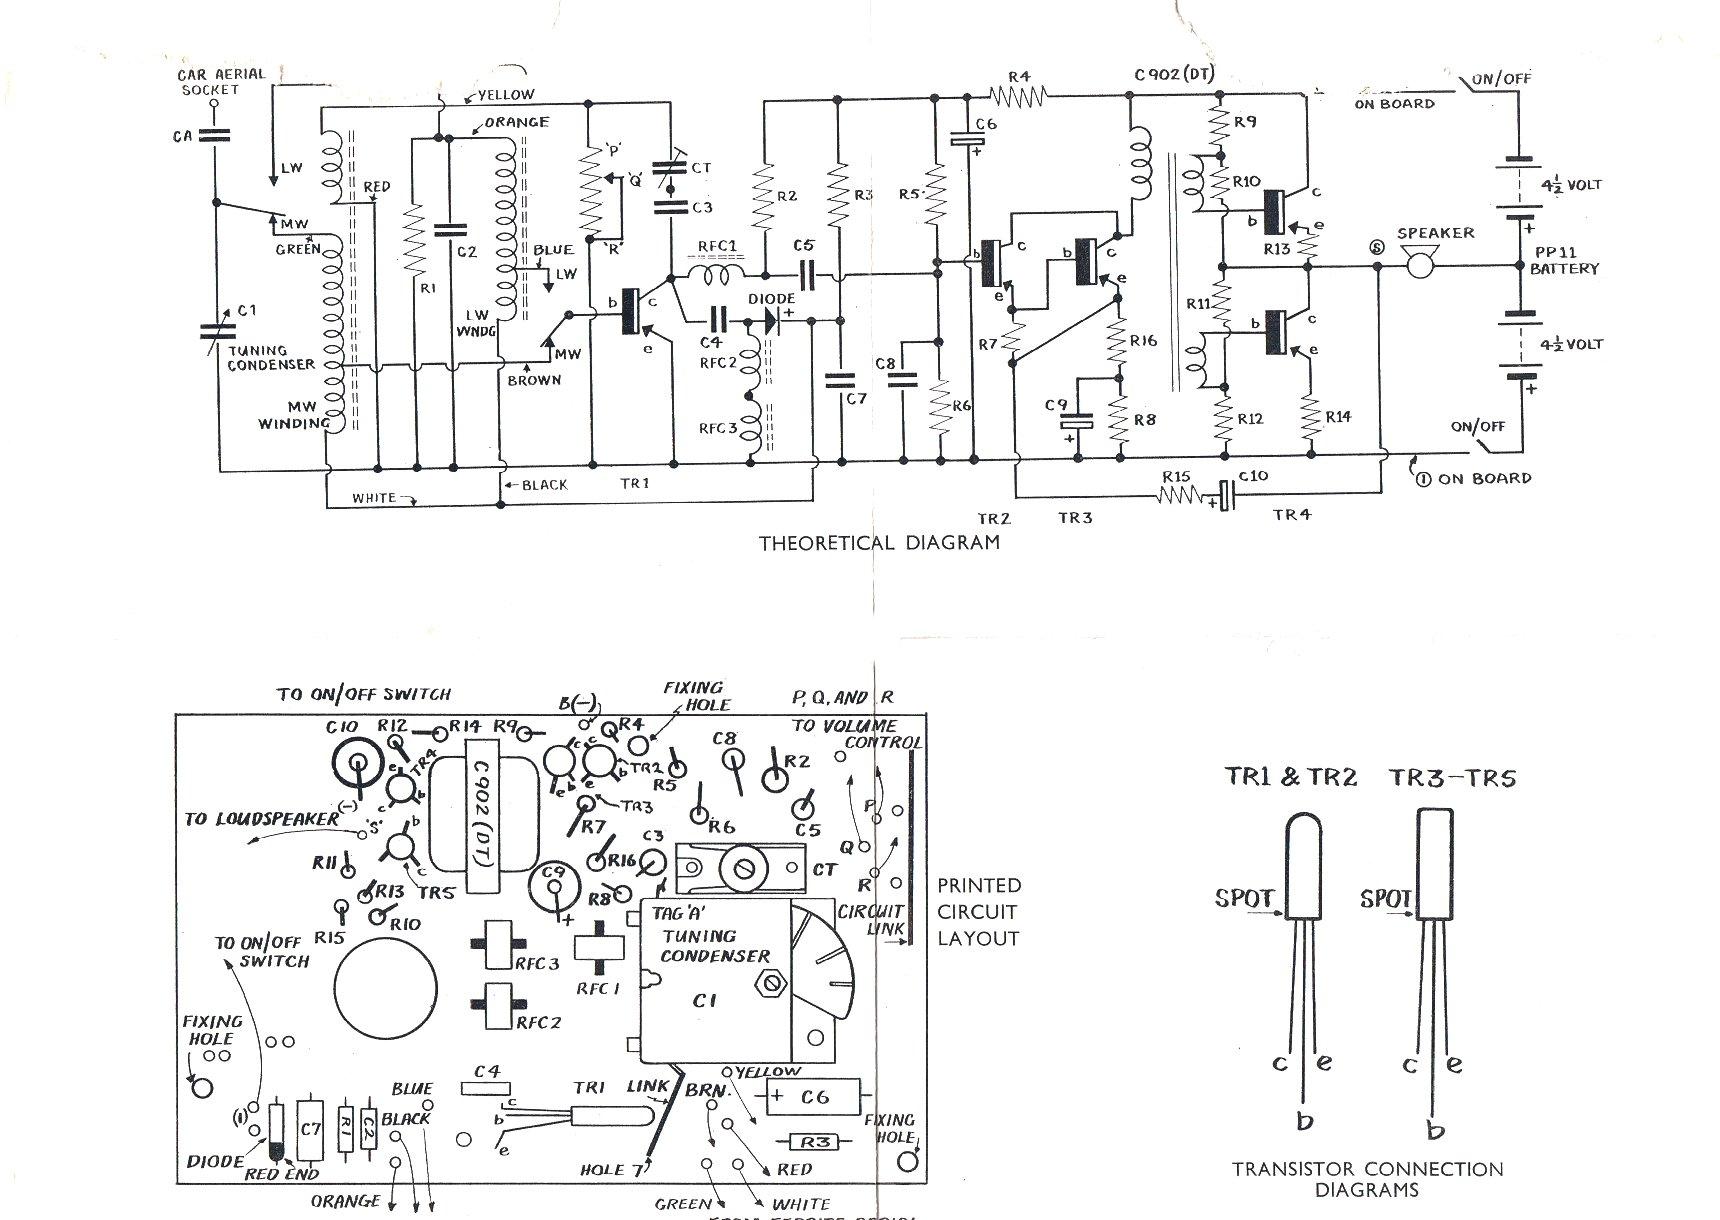 Vintage Radio And Electronics Transfive Transistor